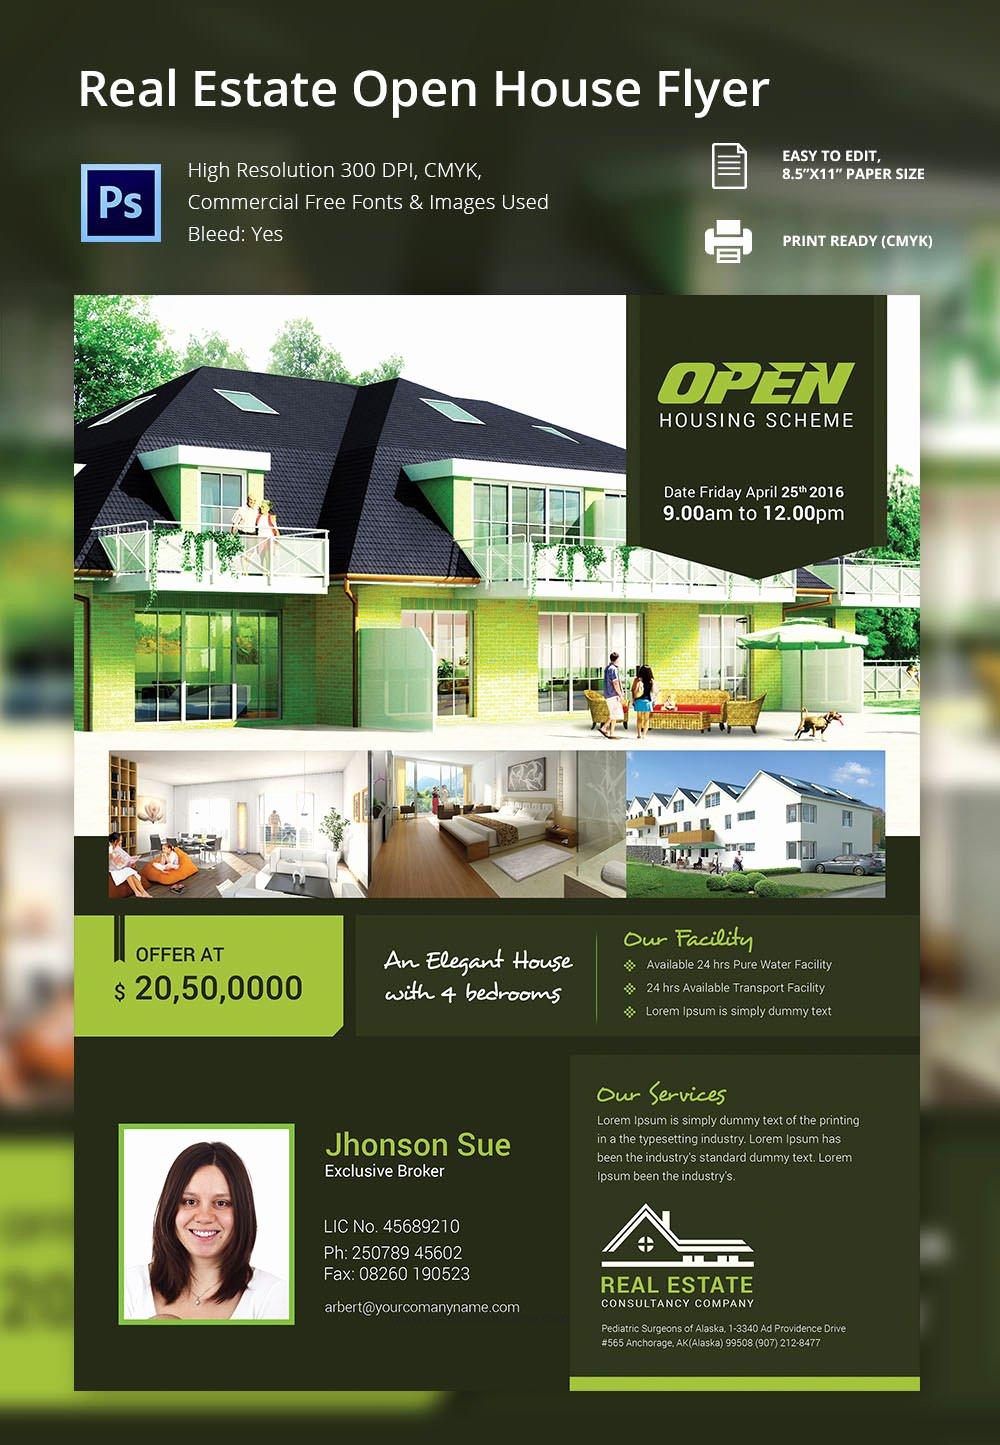 Open House Brochure Template Luxury Open House Flyer Free Psd format Download Brochure